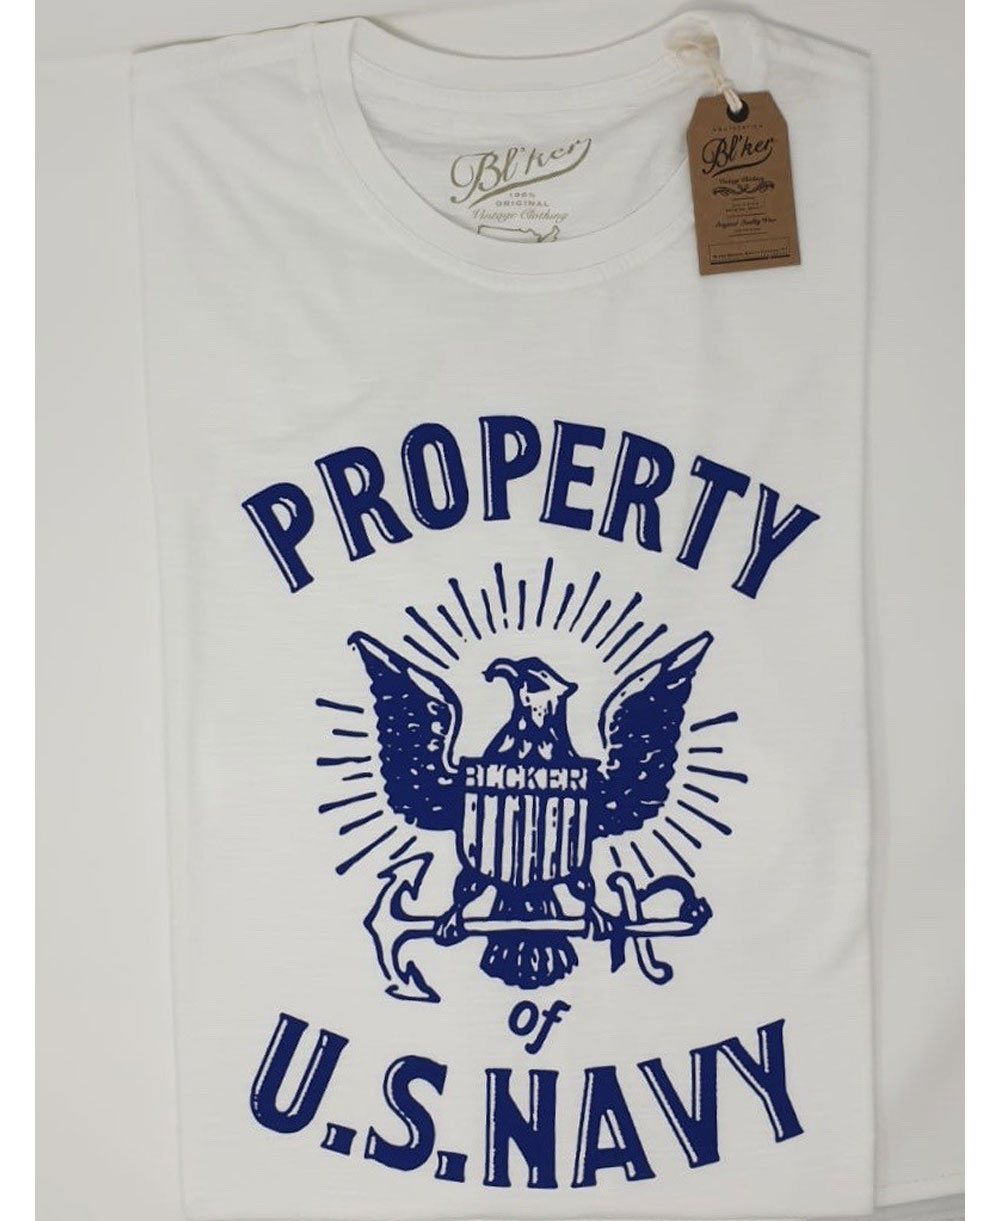 Property USN T-Shirt à Manches Courtes Homme White